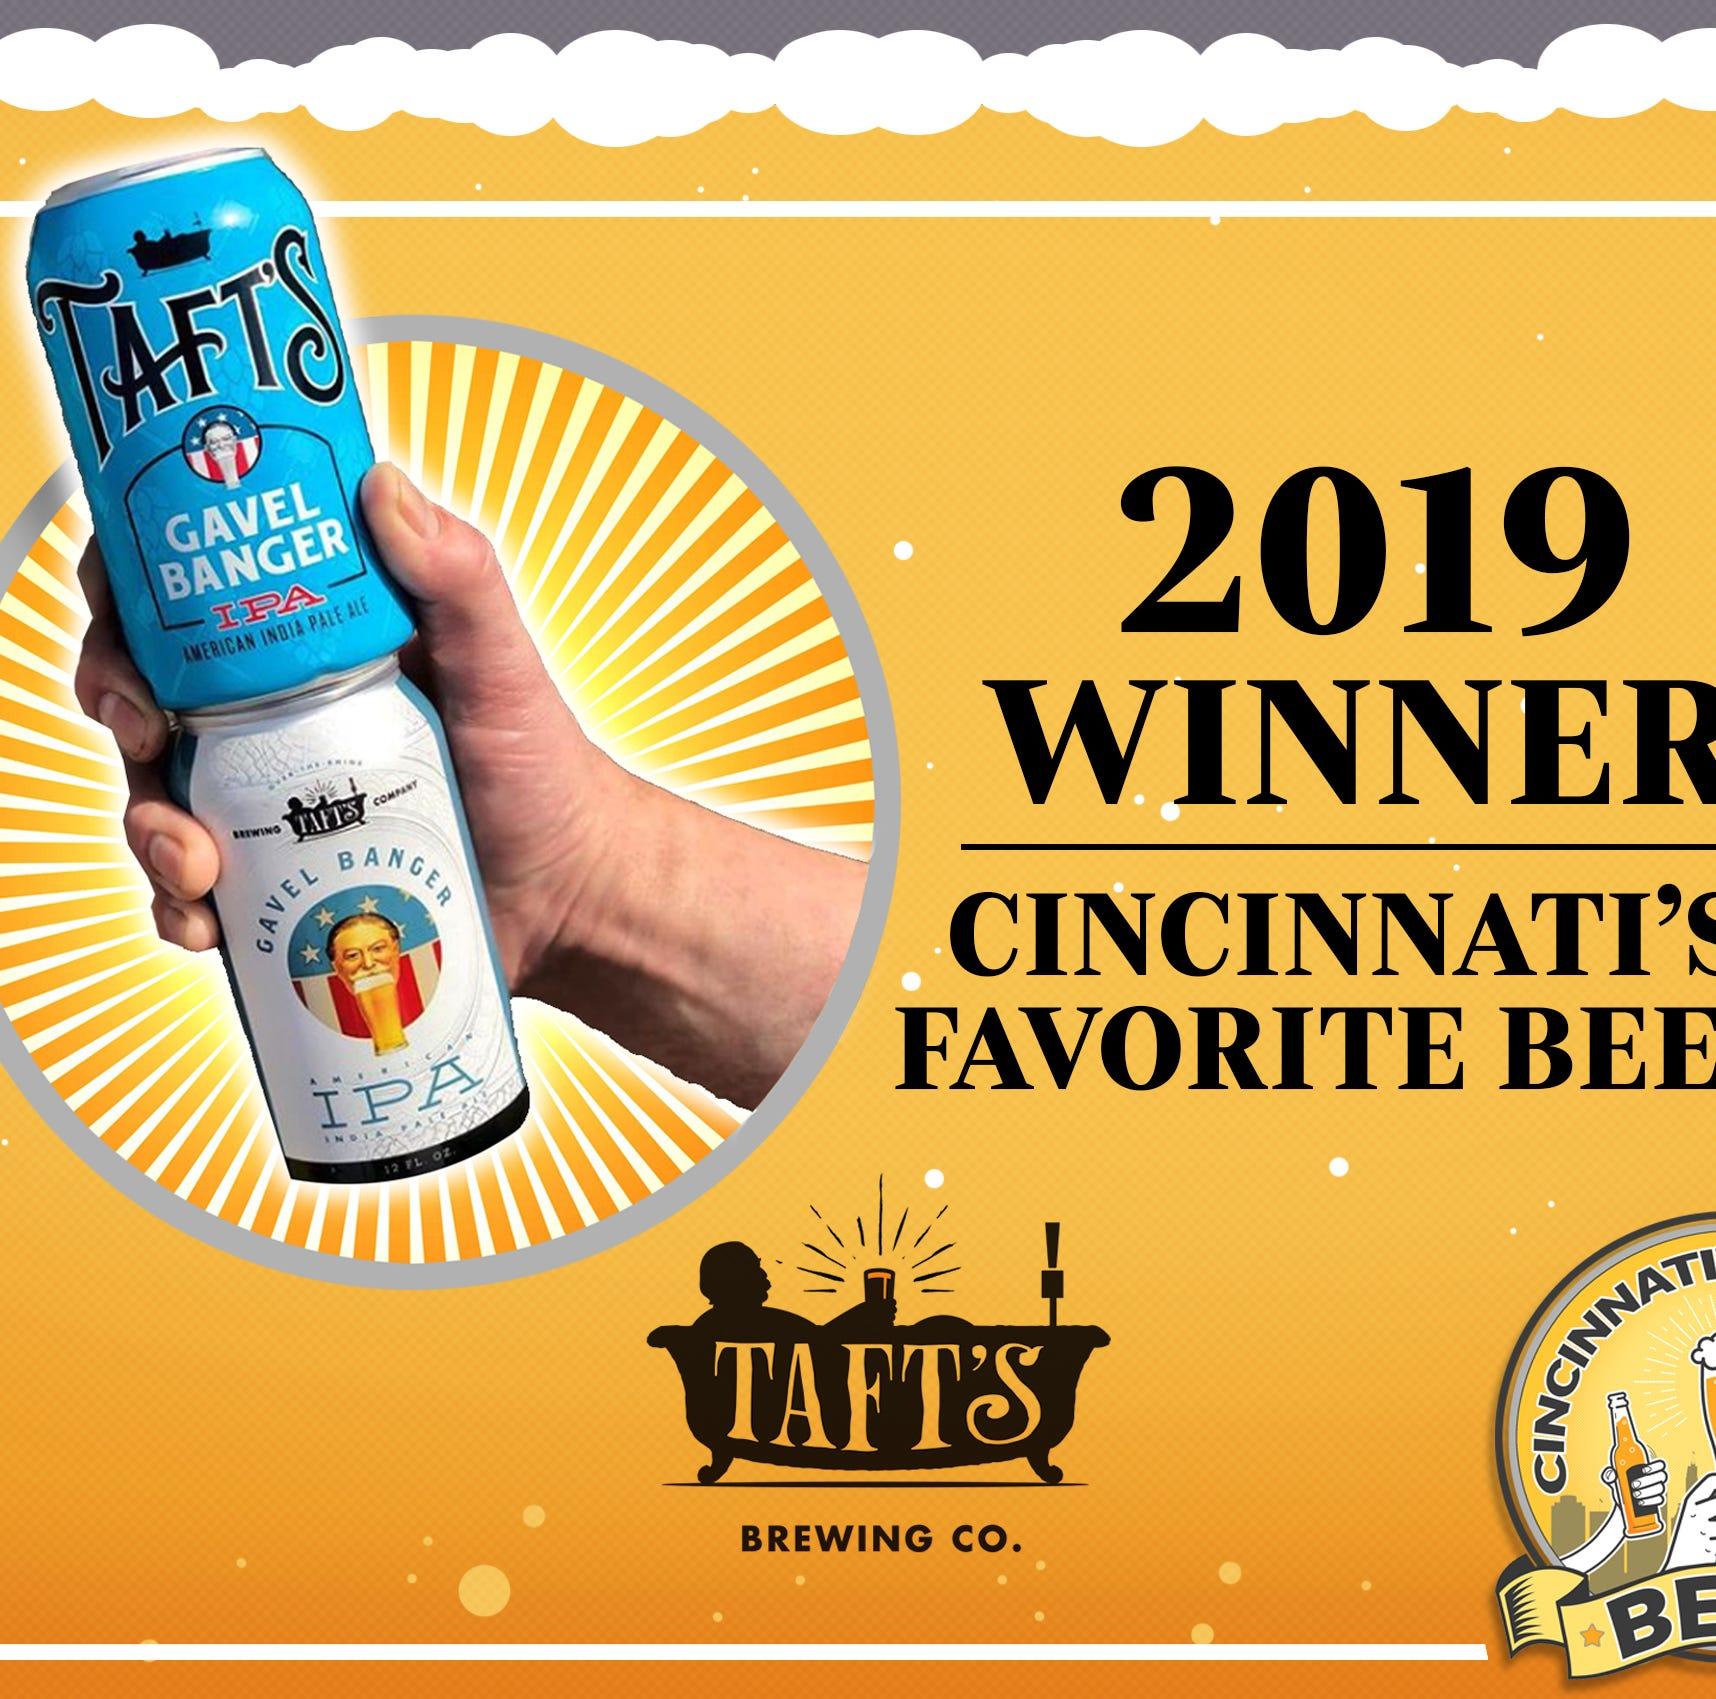 IPA from Taft's wins Cincinnati's Favorite Beer 2019